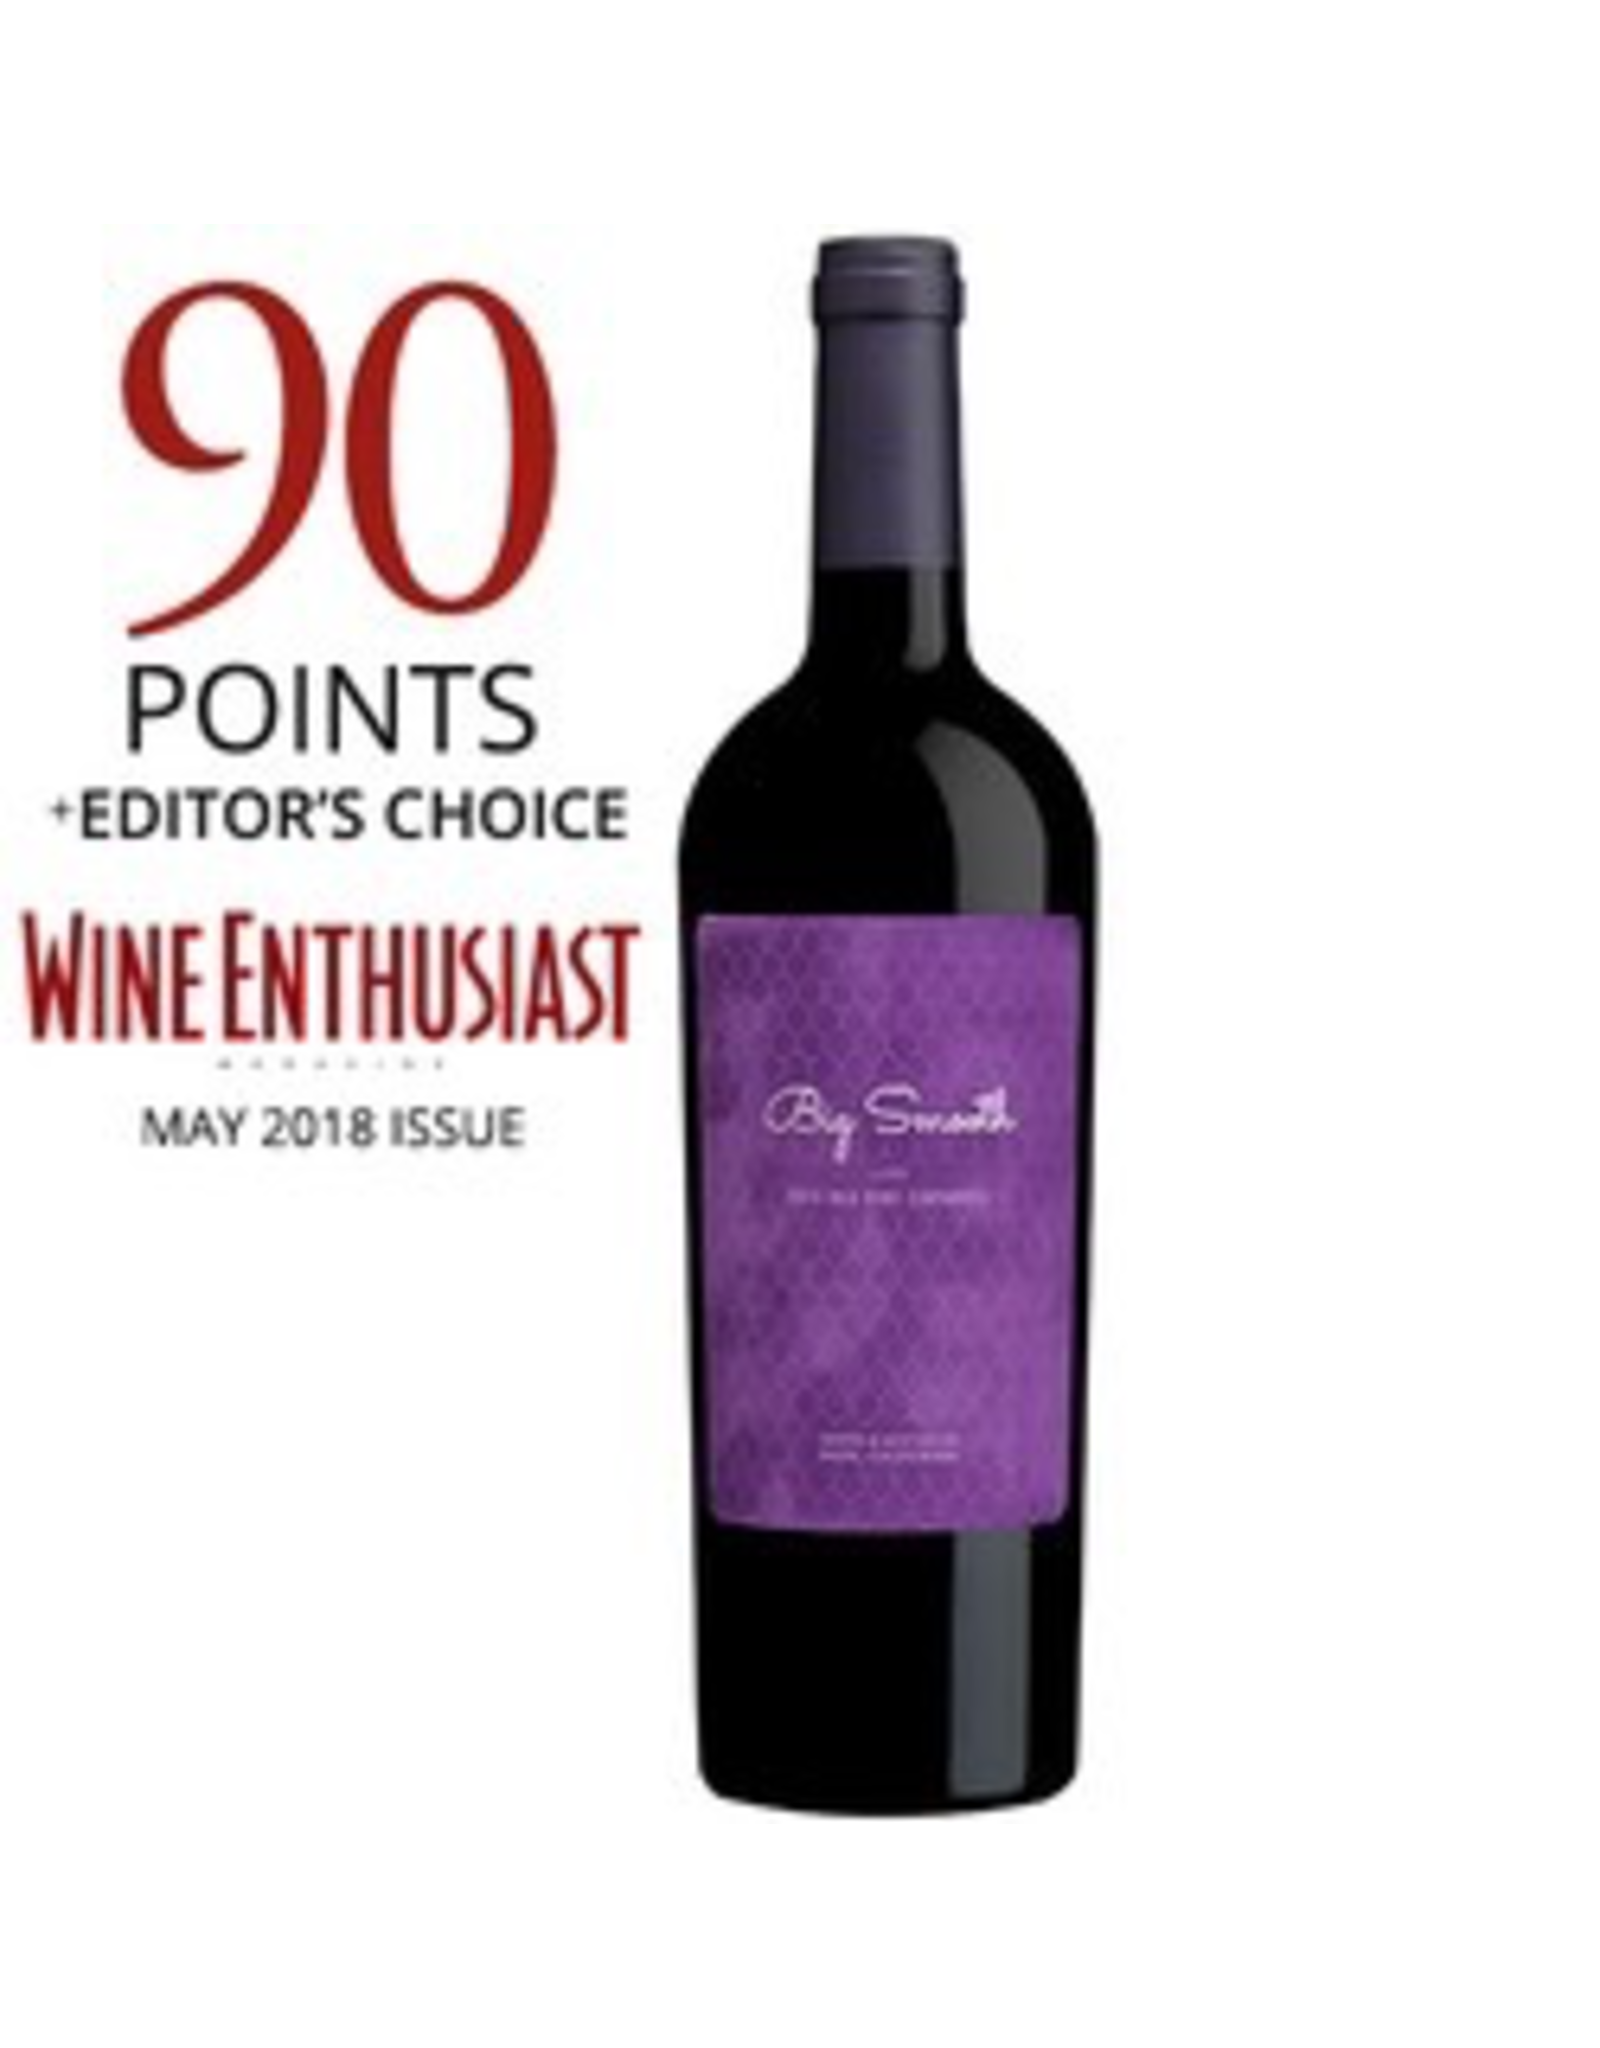 Red Wine 2016, Big Smooth by Sebastiani & Sons, Old Vine Zinfandel, Lodi, Central Valley, California, 15.0% Alc, CTnr